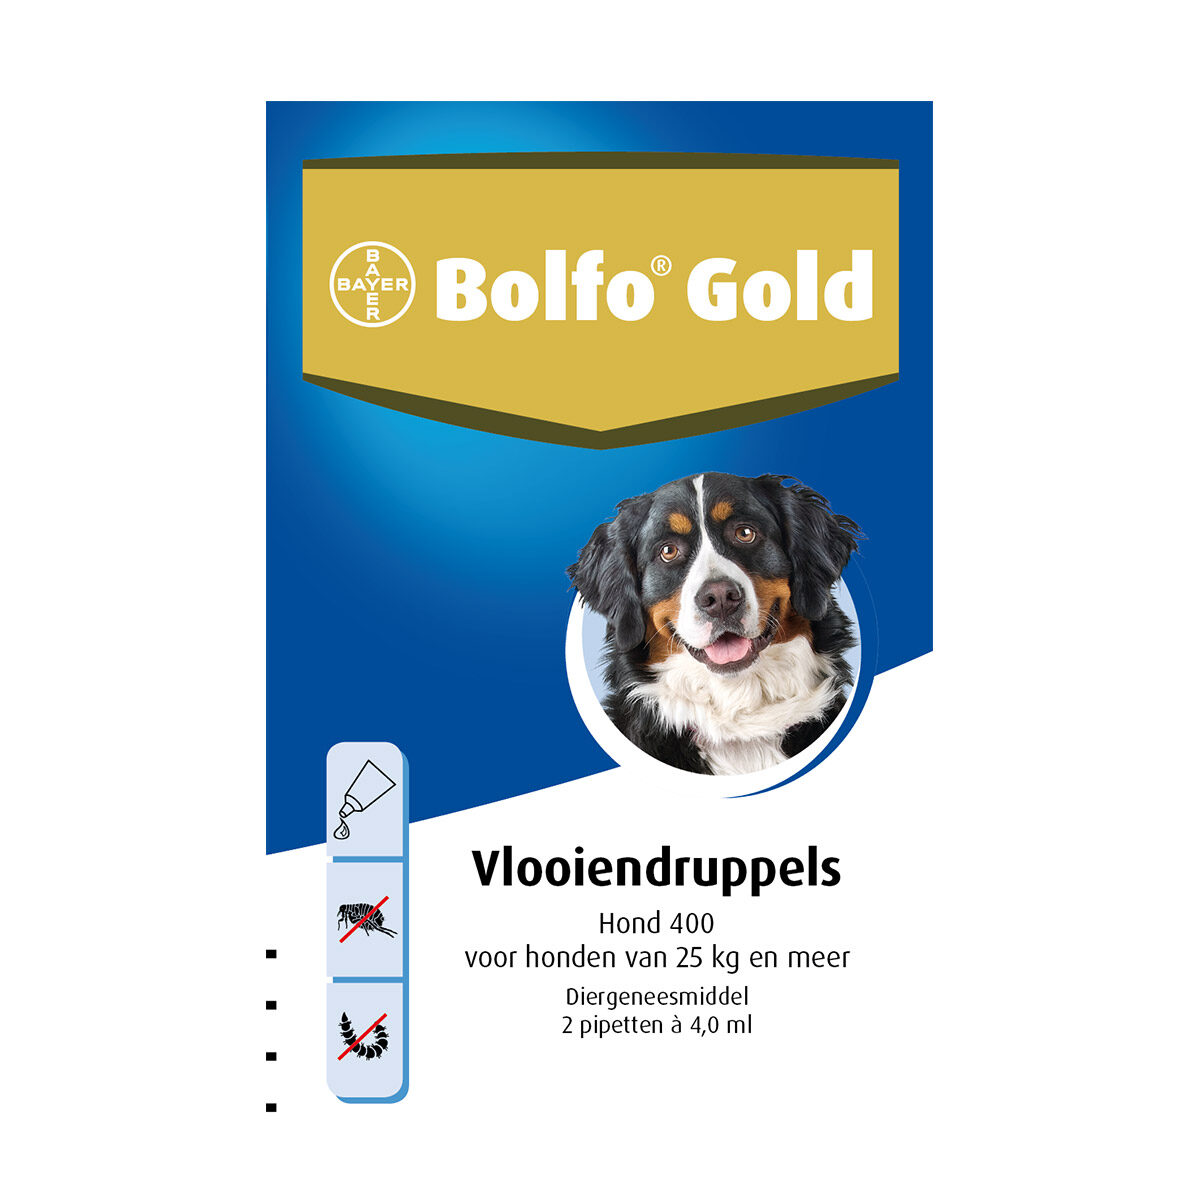 Bolfo Gold Hond 400 Vlooiendruppels 25 tot 40 kg 2 Pipetten